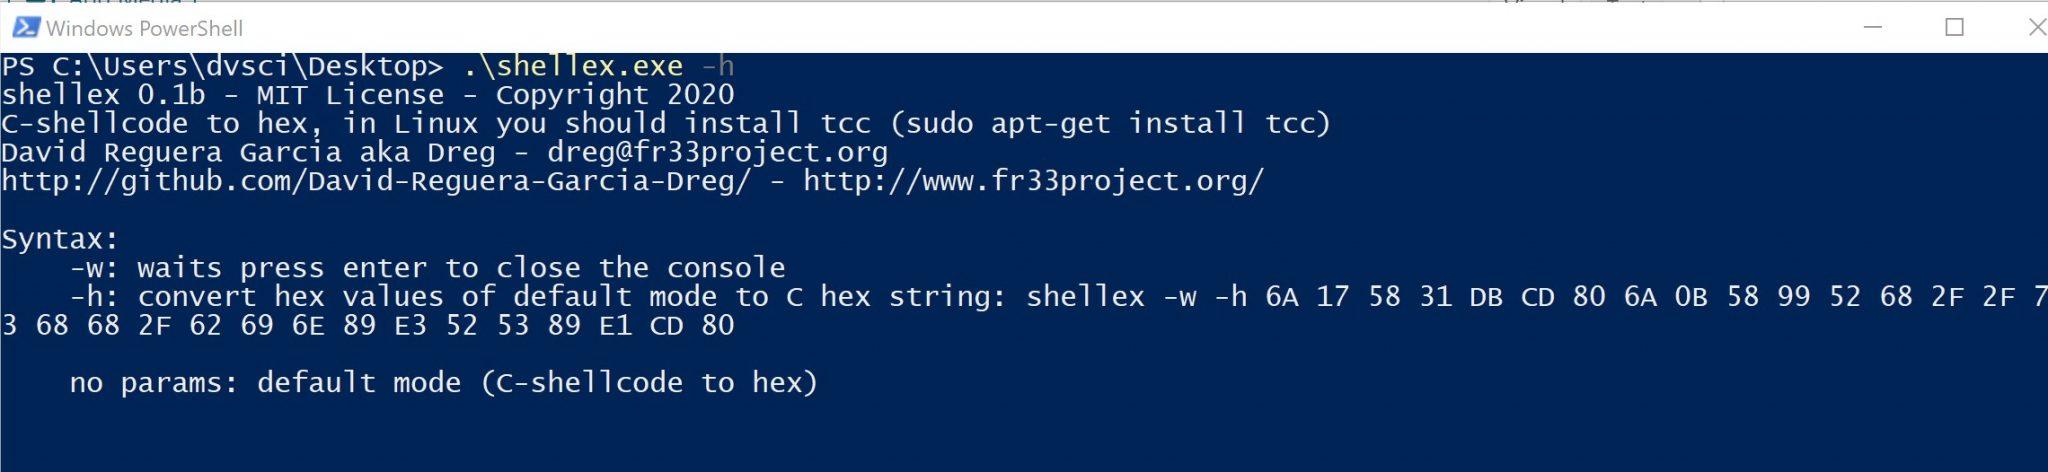 shellex: C-shellcode to hex converter